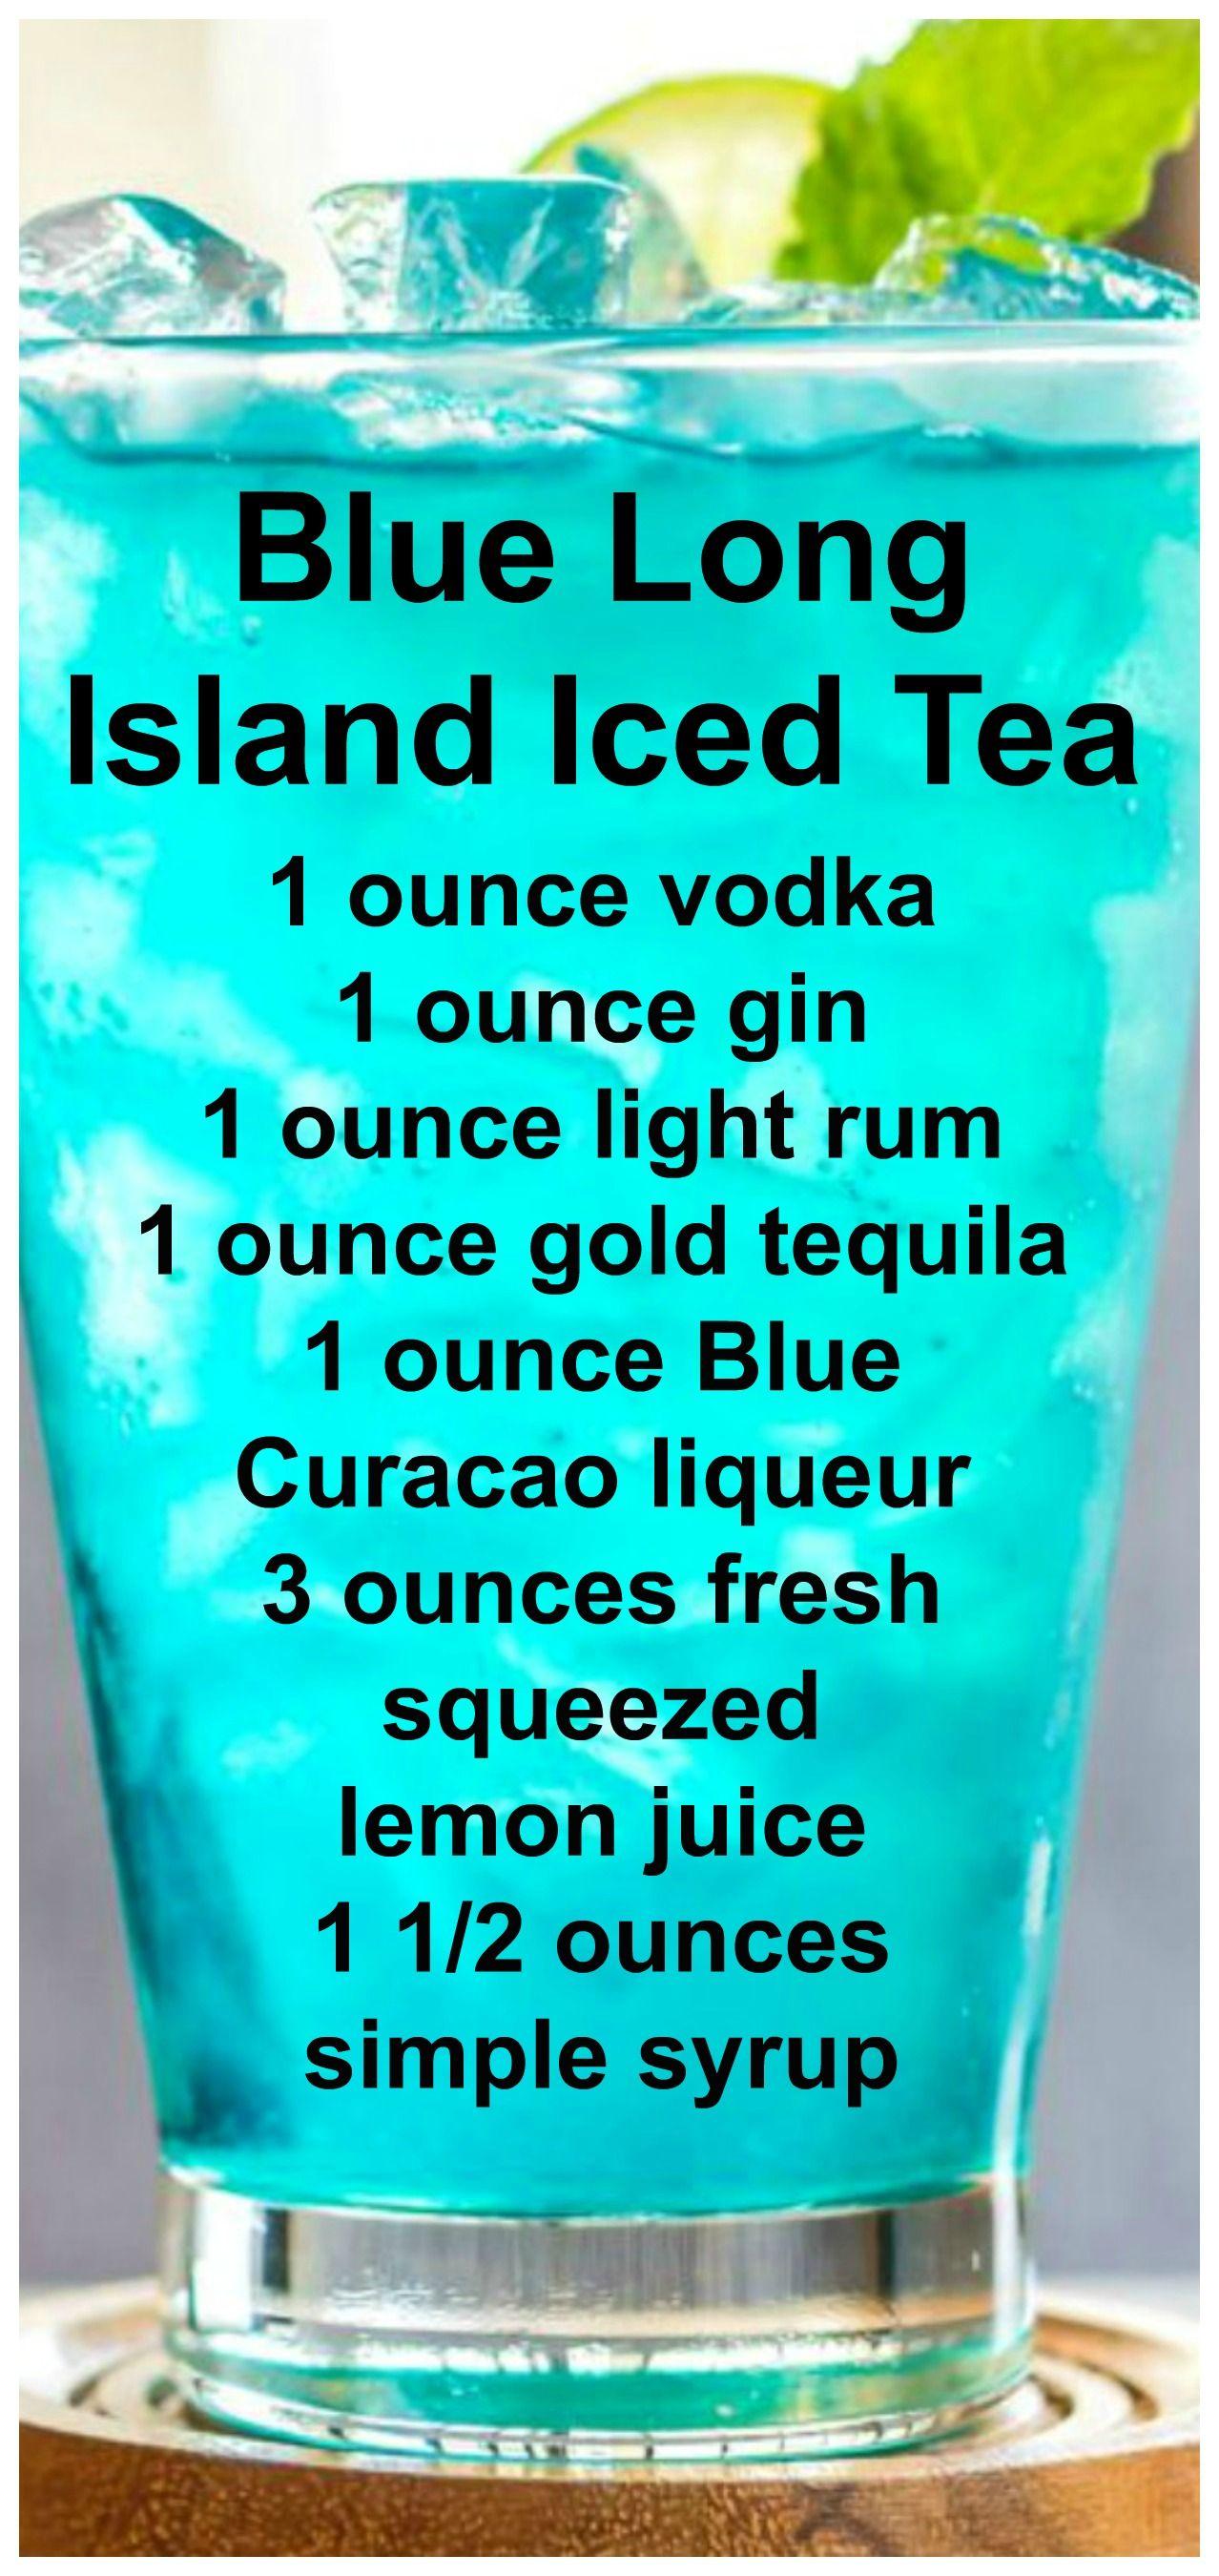 Blue Long Island Iced Tea Drink Recipe Mix That Drink Recipe Long Island Iced Tea Drinks Alcohol Recipes Iced Tea Drinks